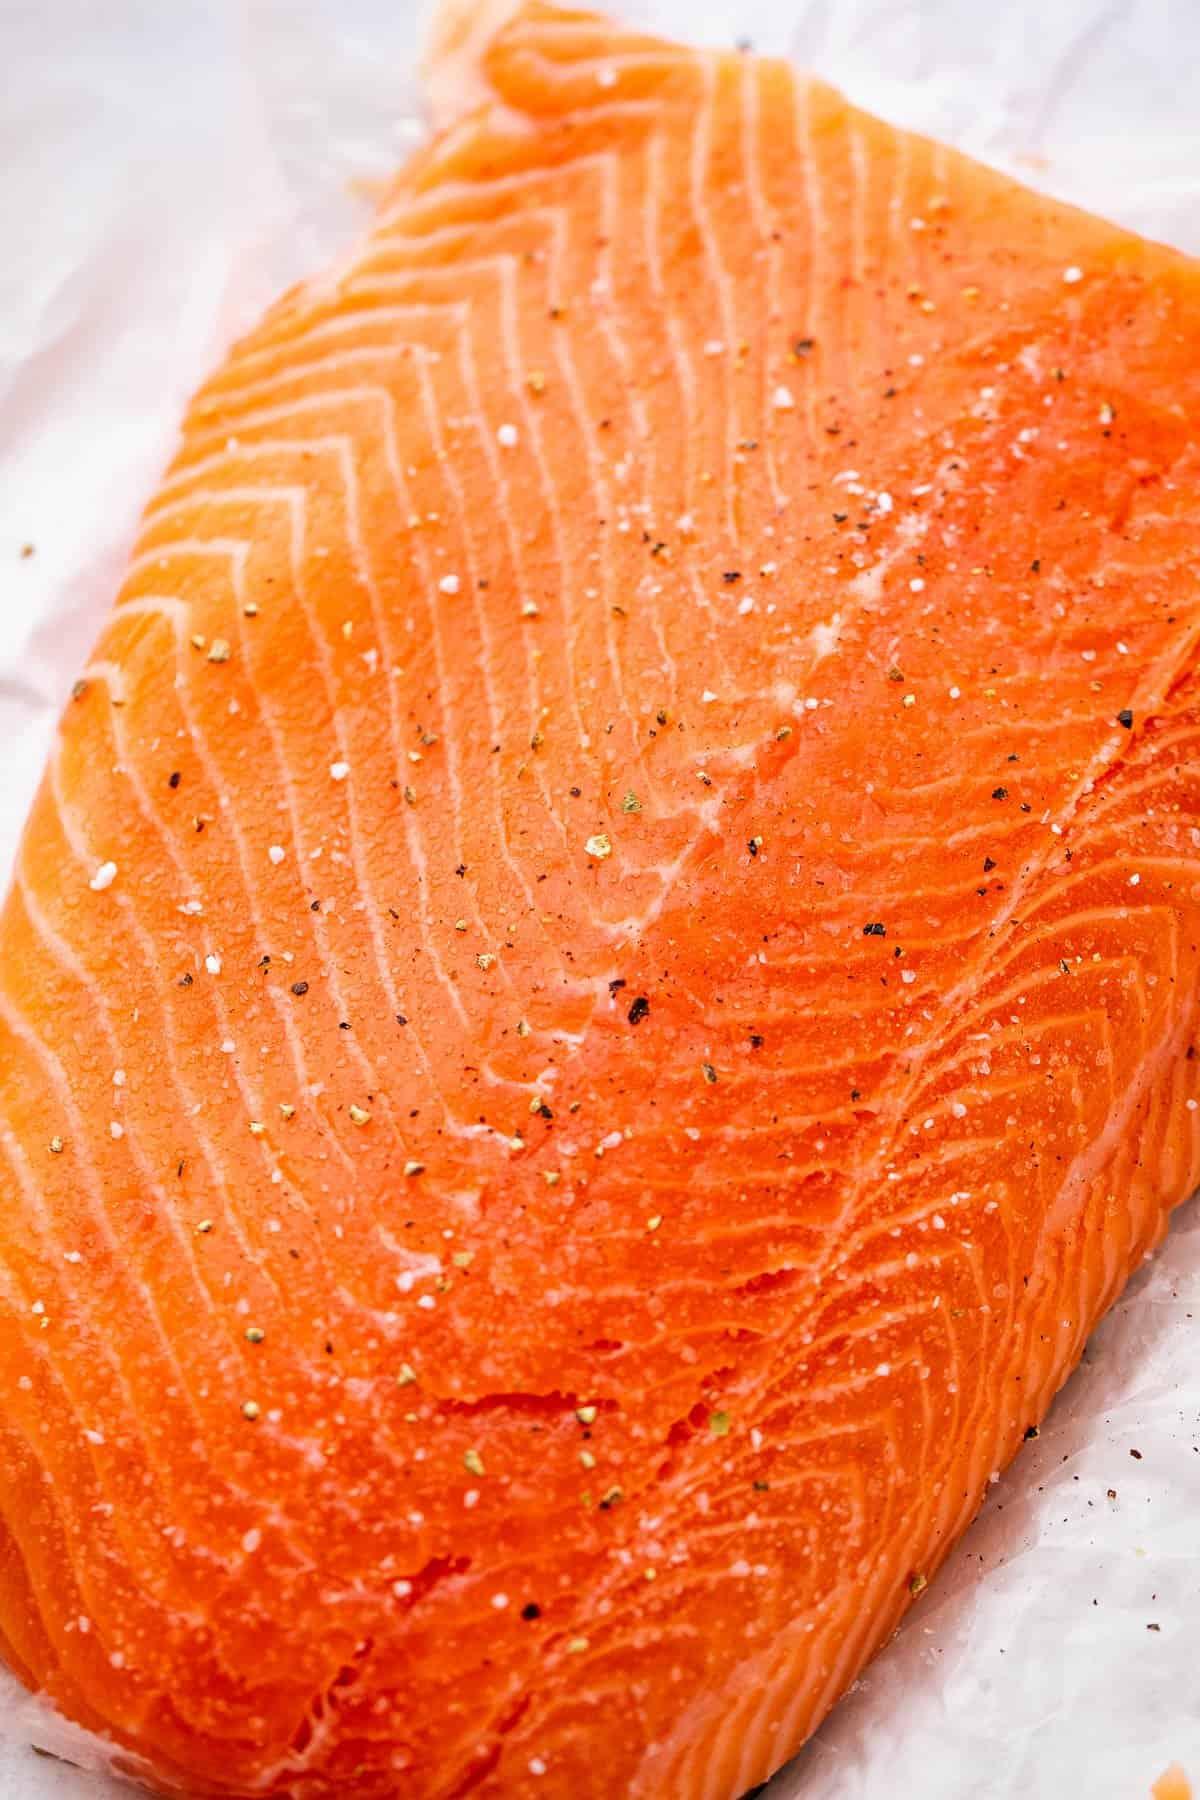 whole raw salmon fillet